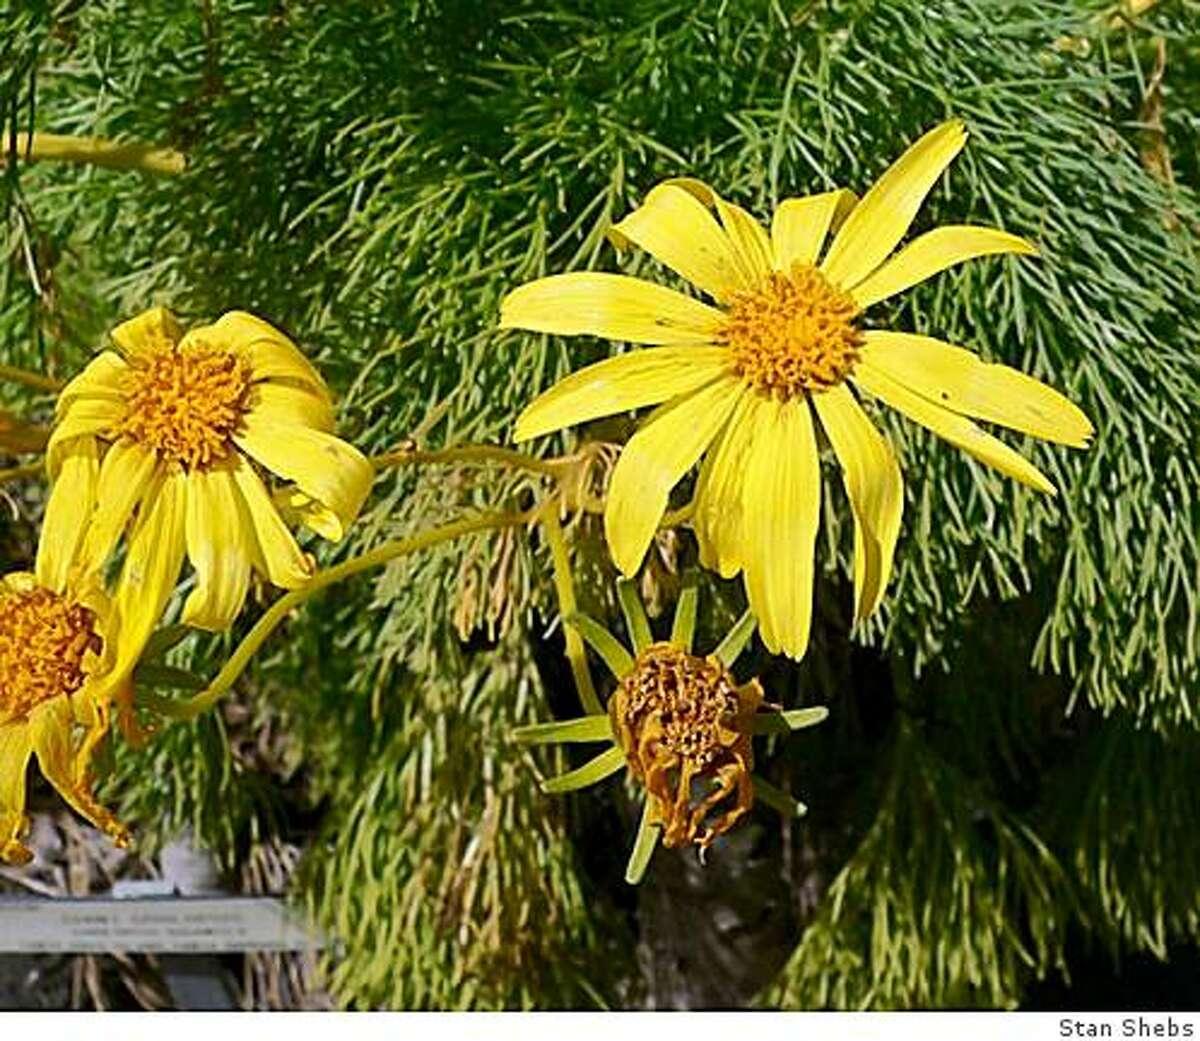 Coreopsis gigantea, UC Botanical Garden, Berkeley, April 2007